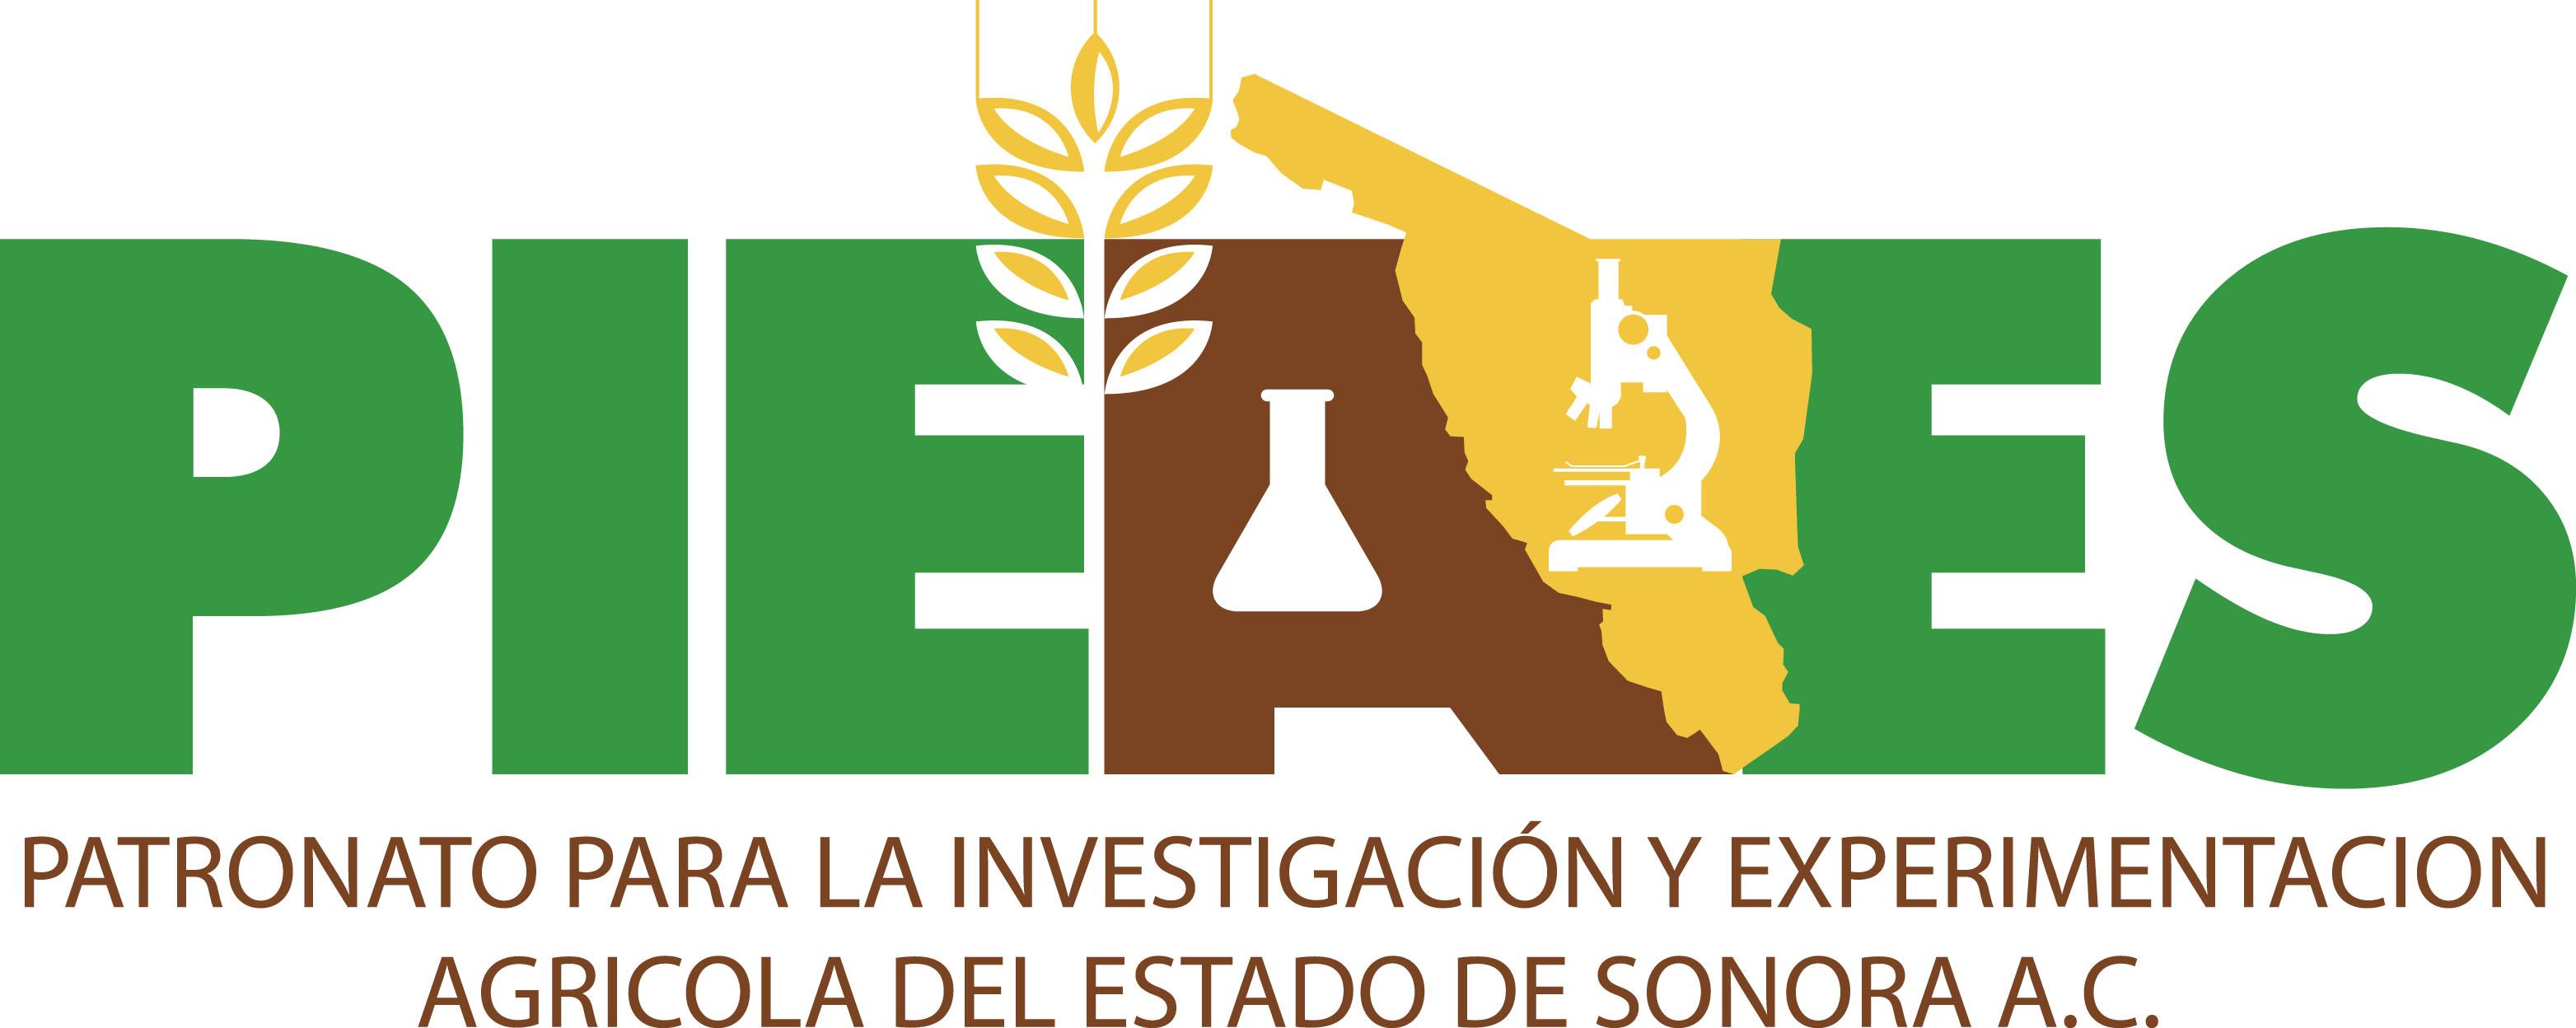 PIEAES logo